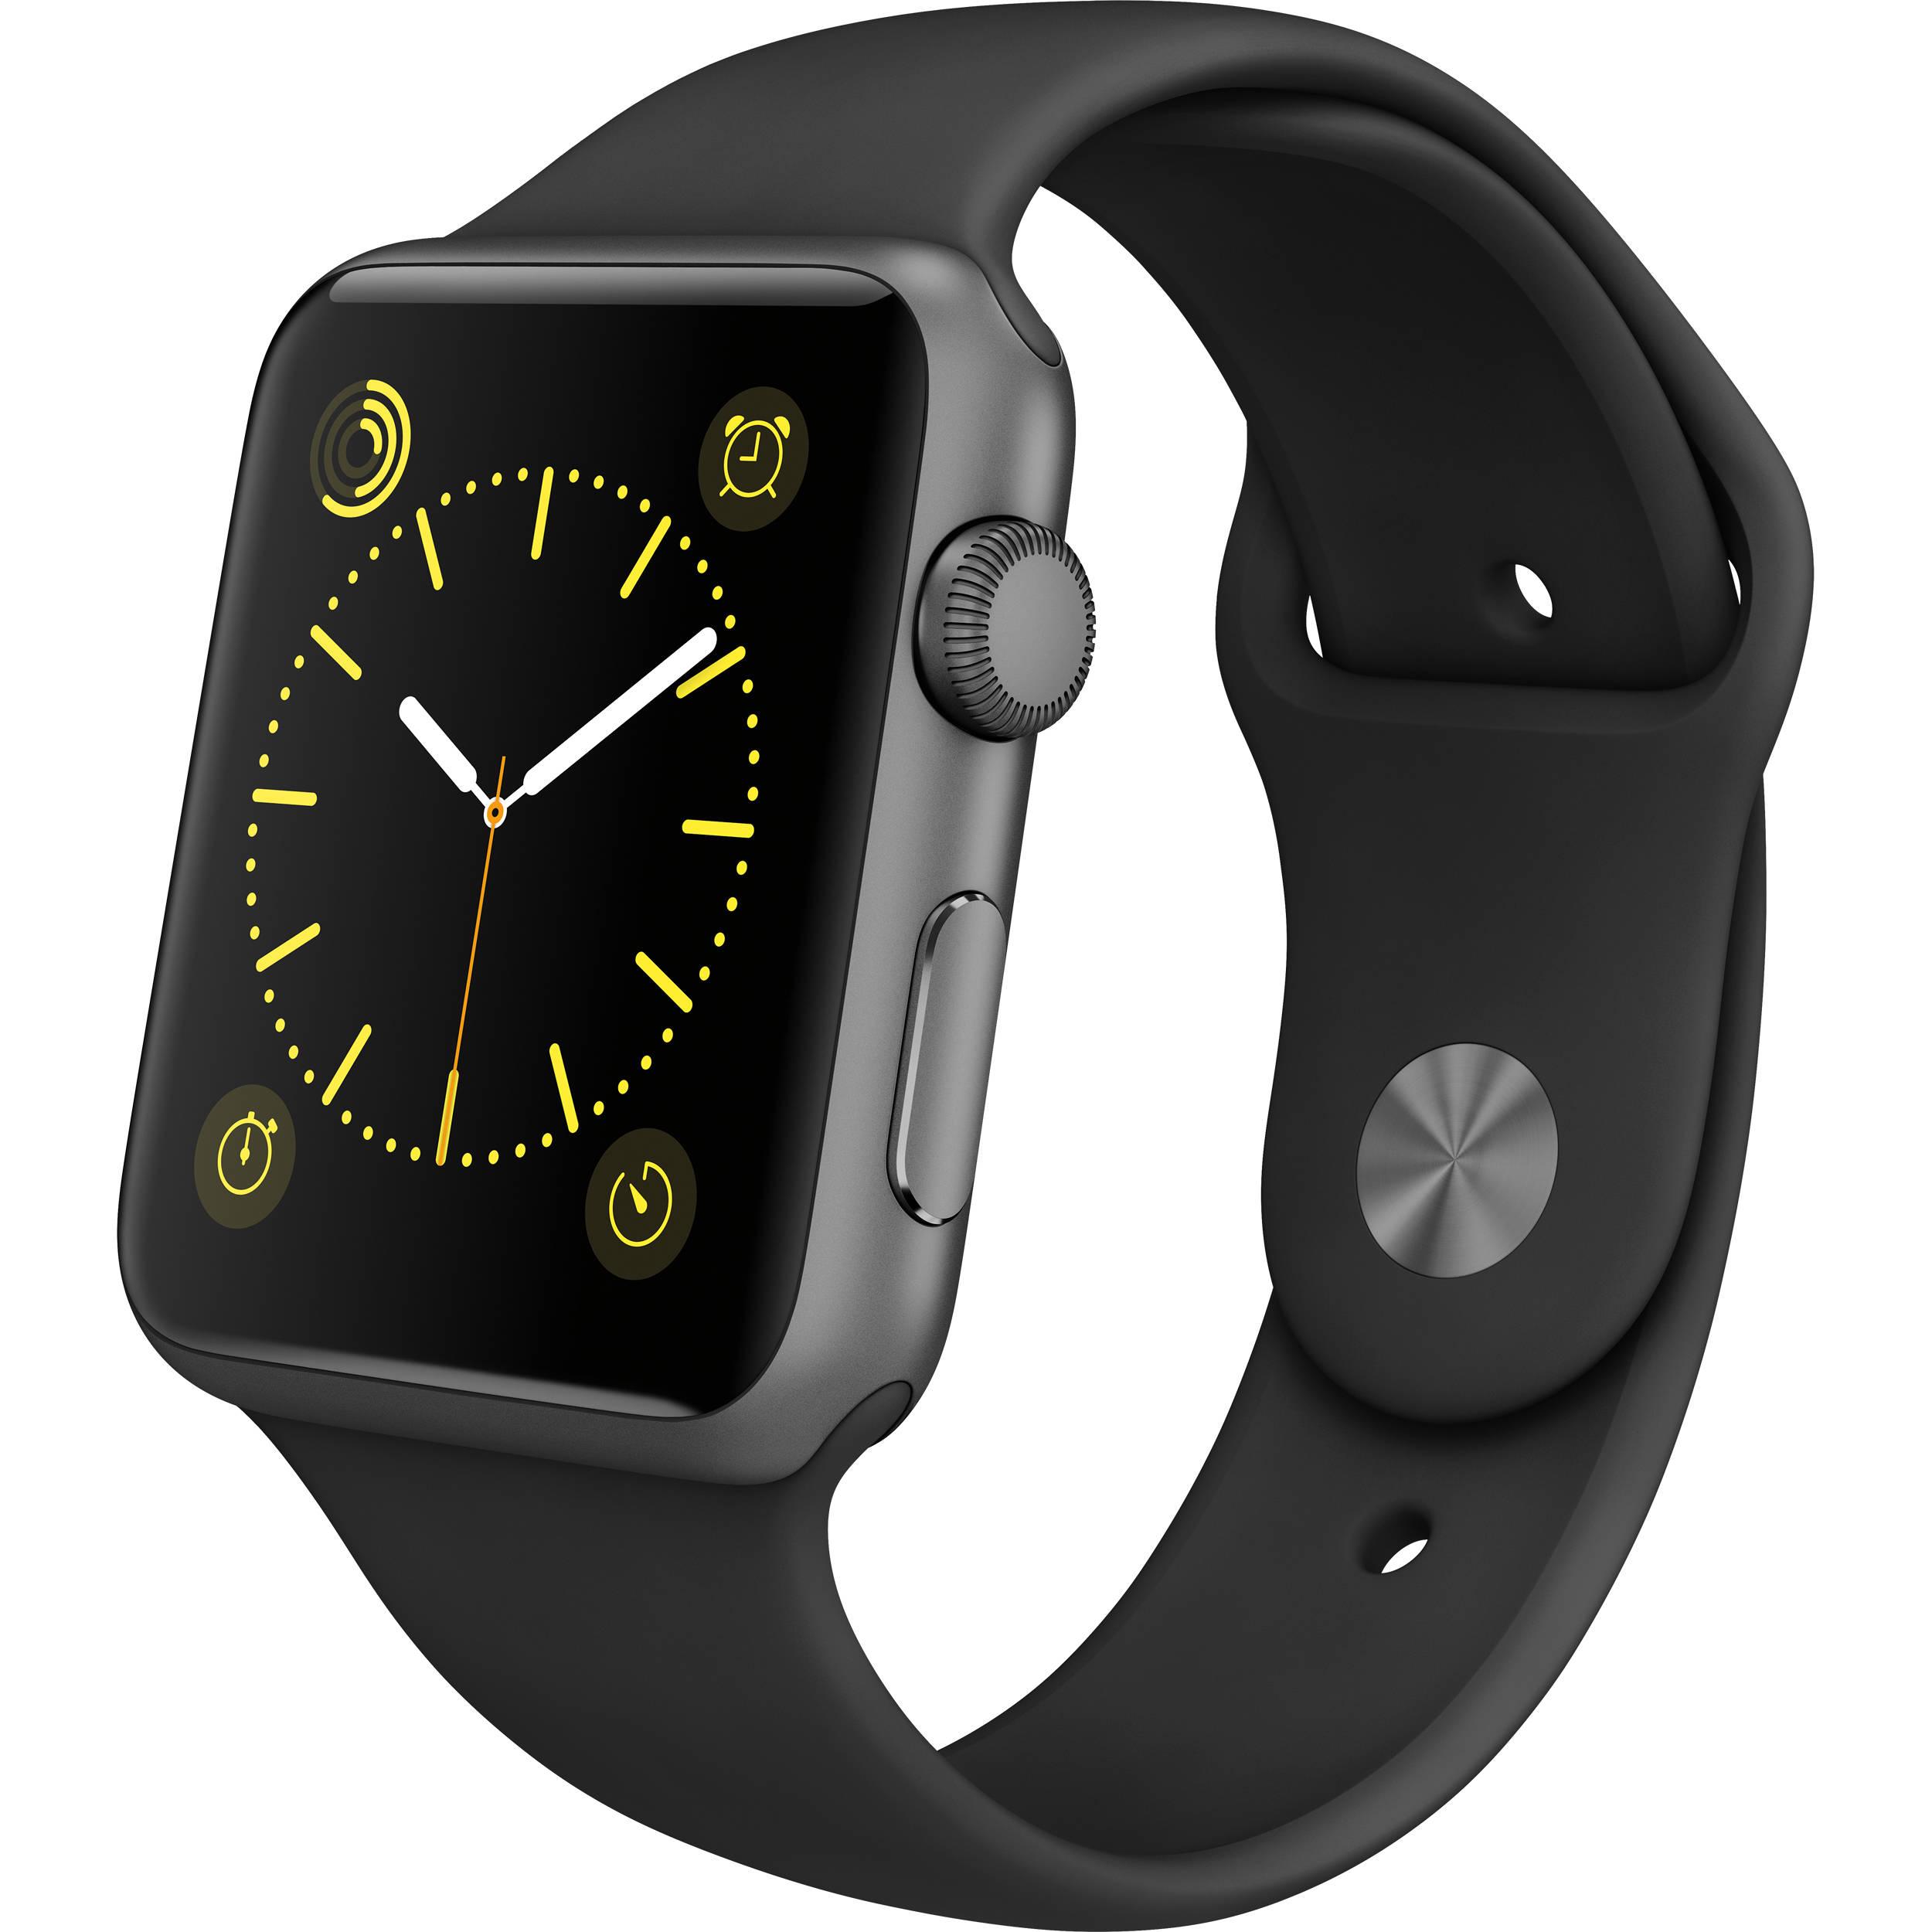 Apple Smart Watch Sport Watch B Amp H Photo Video